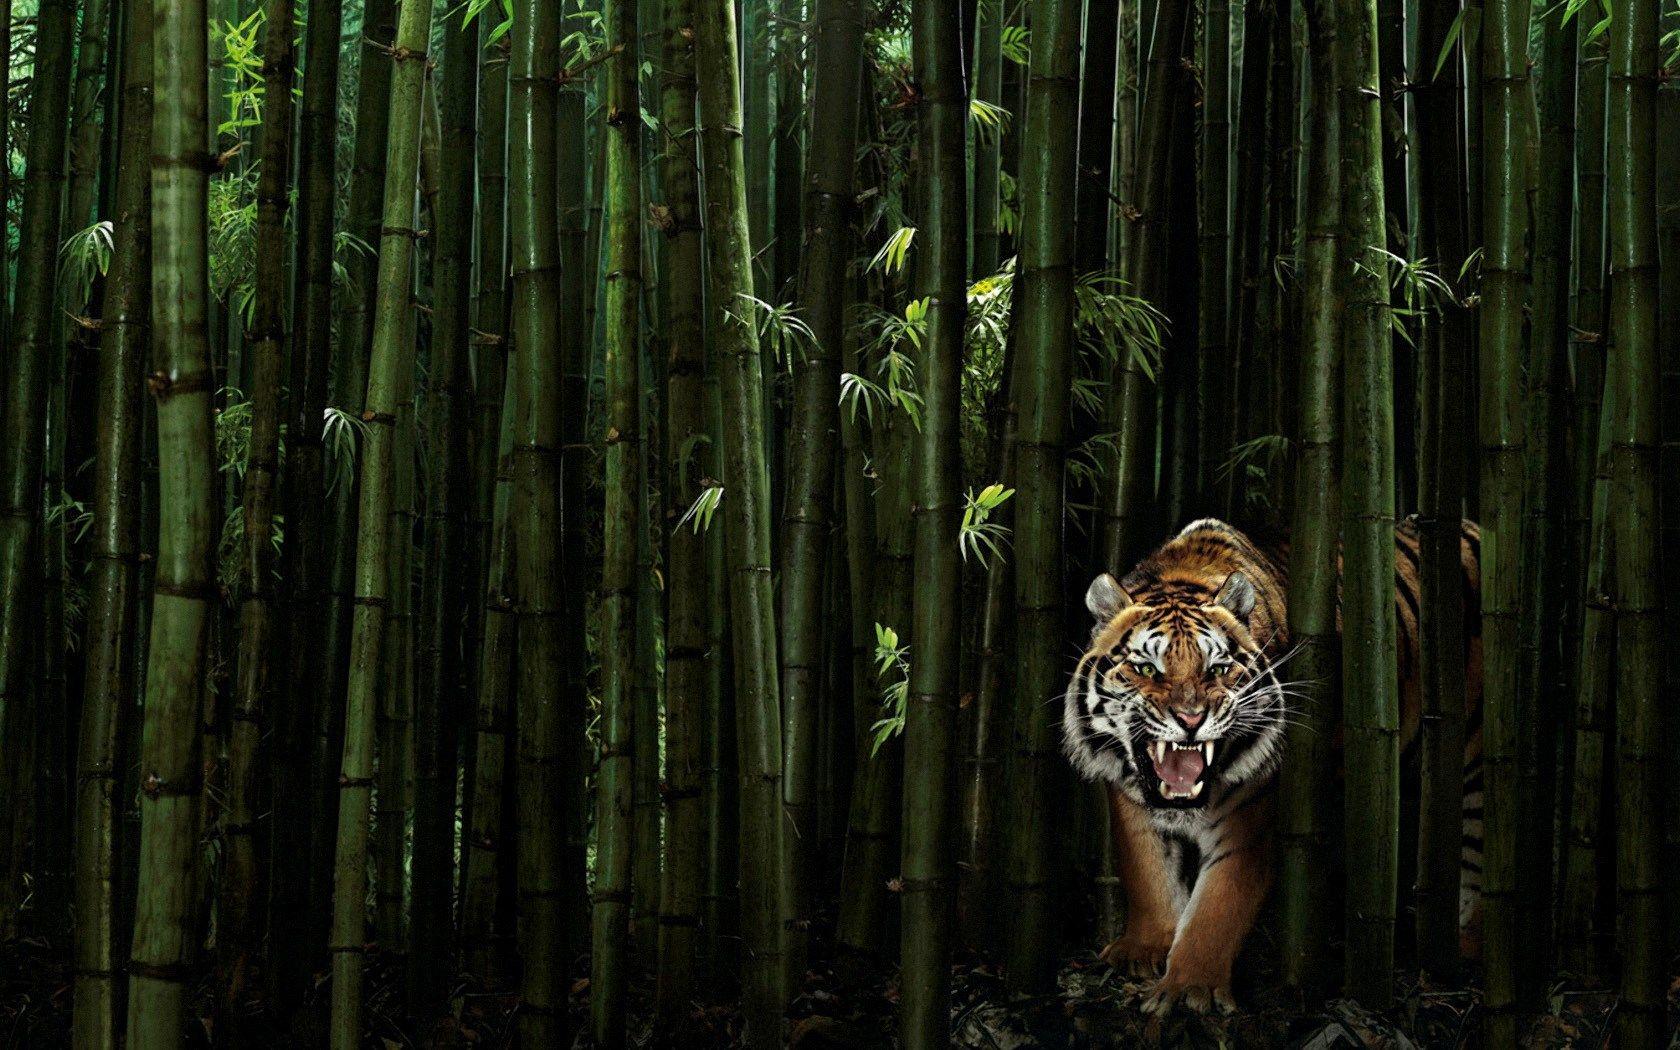 Nature animals wallpaper 1920x1280 nature animals tigers wildlife - Free Screensaver Tiger Picture Buford Grant 2017 03 07 Tiger Wallpaperanimal